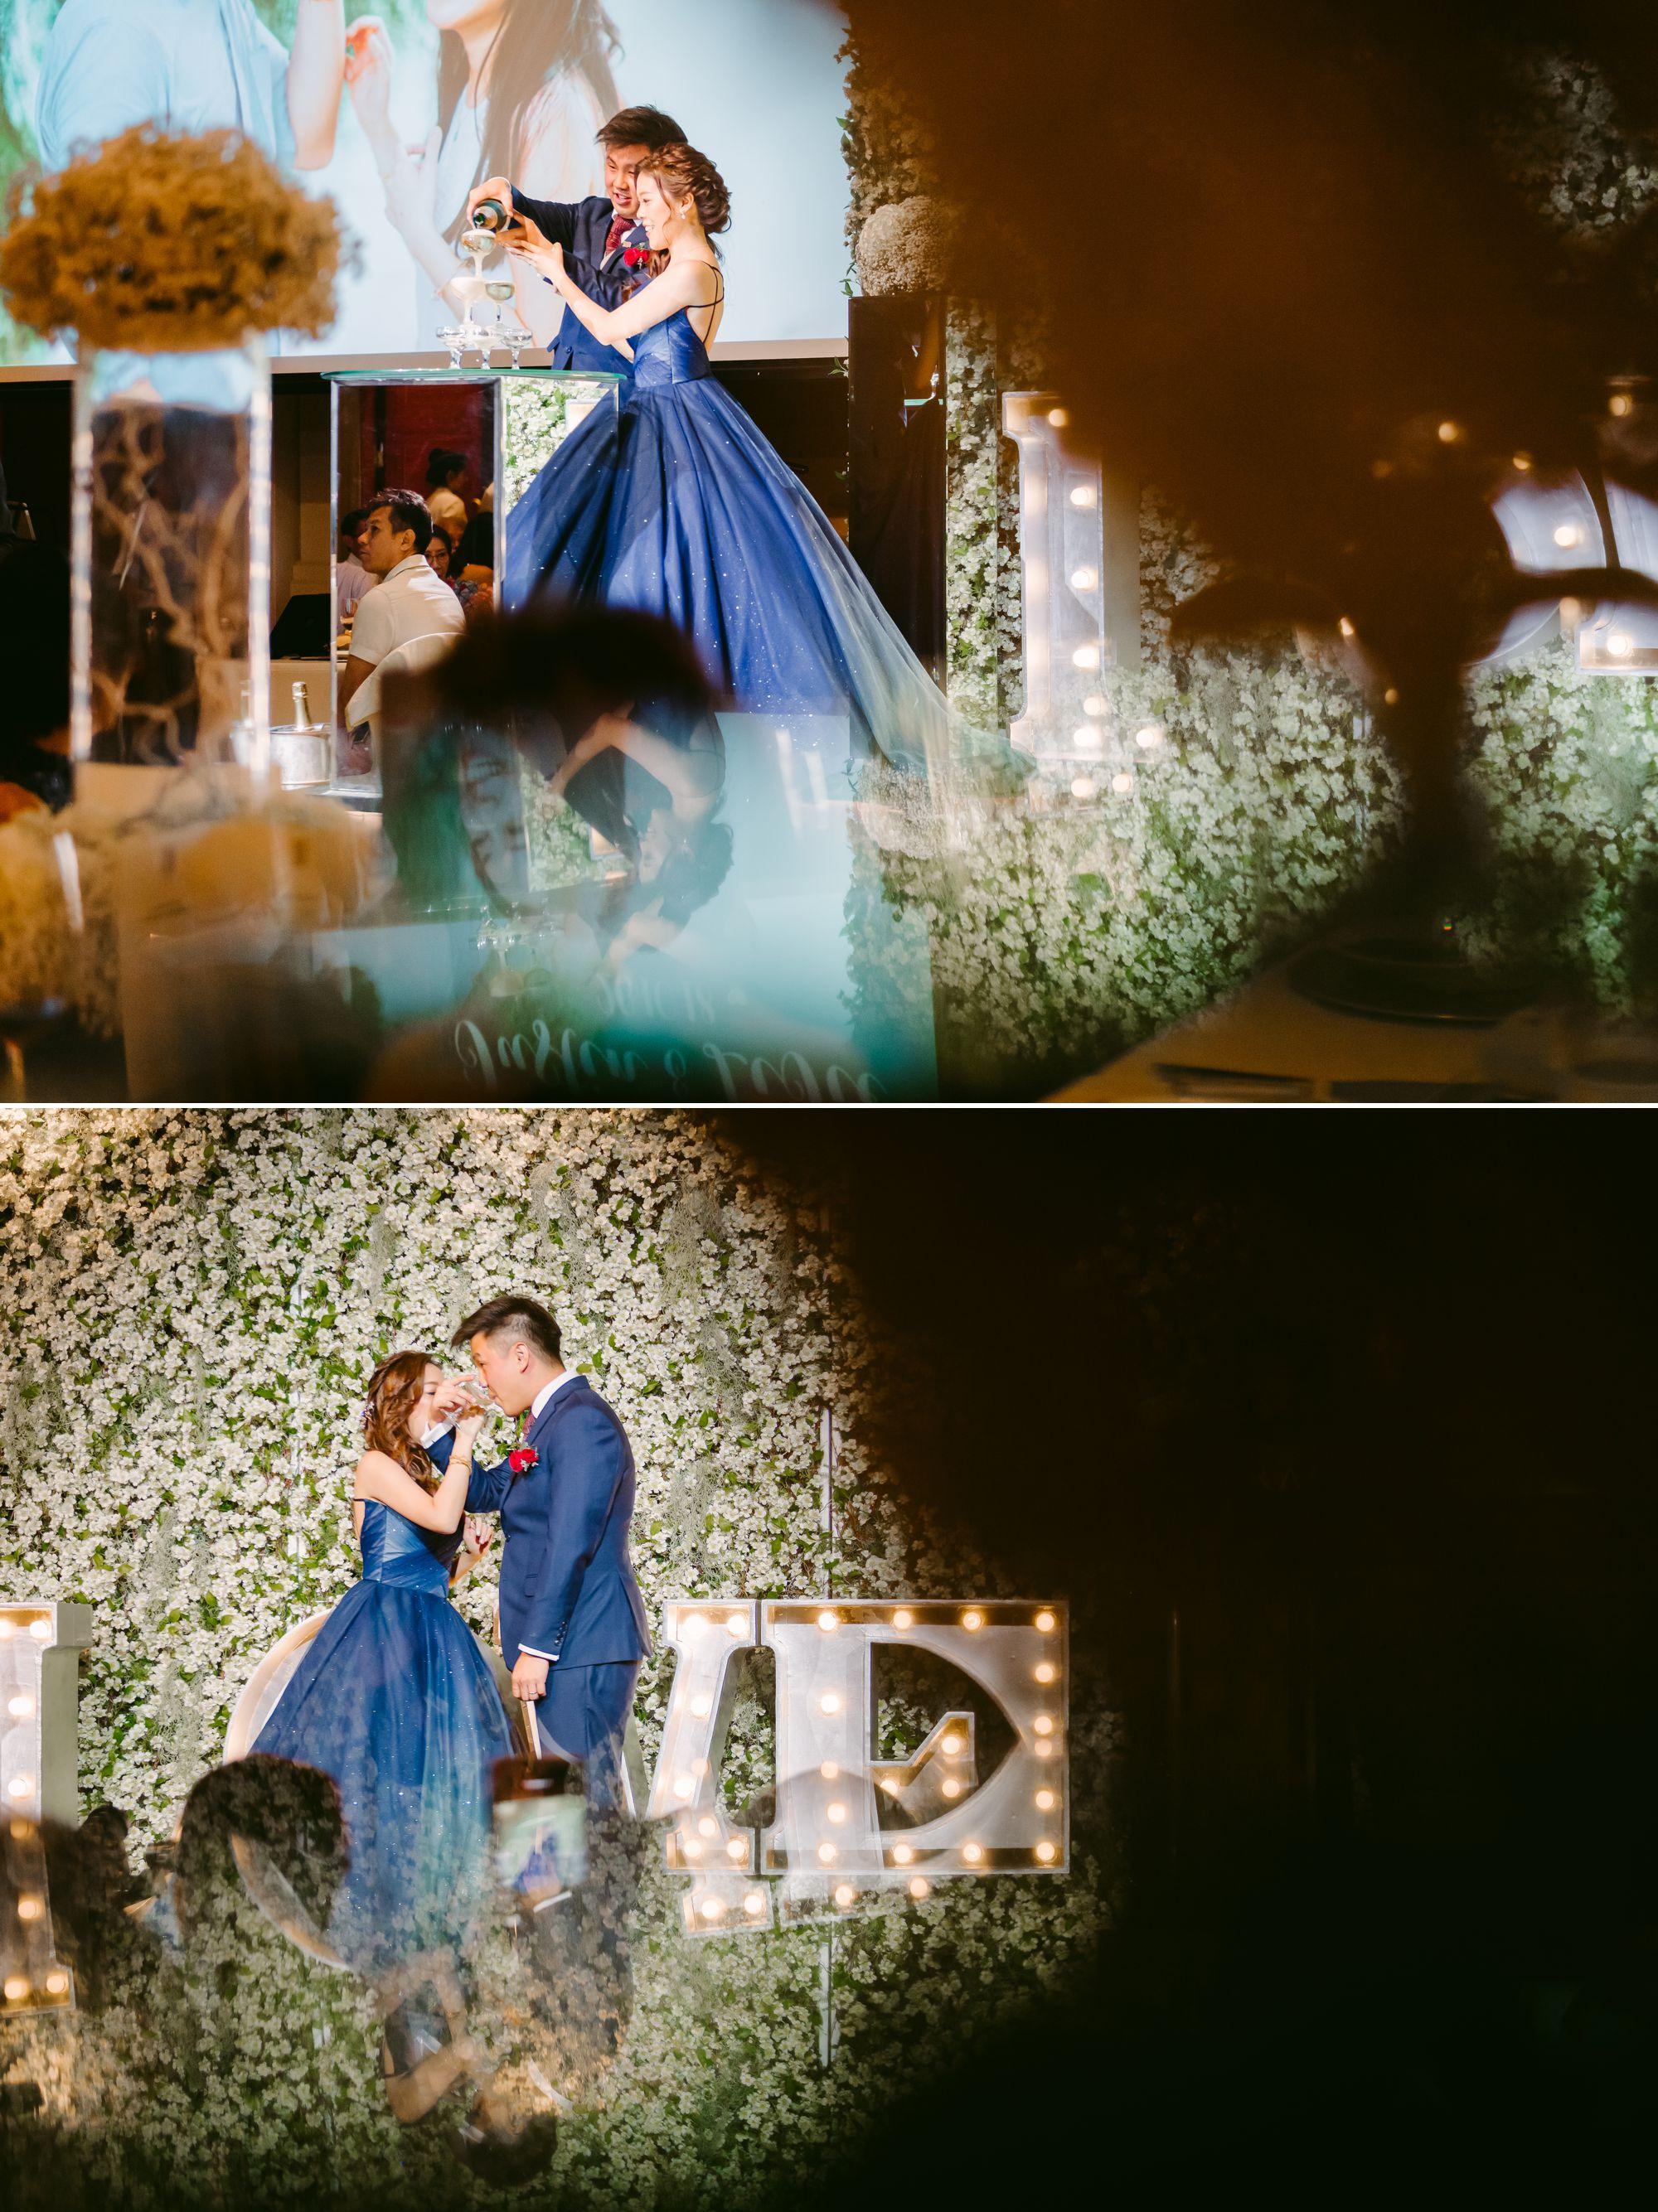 conrad_wedding_Singapore_ 41.jpg